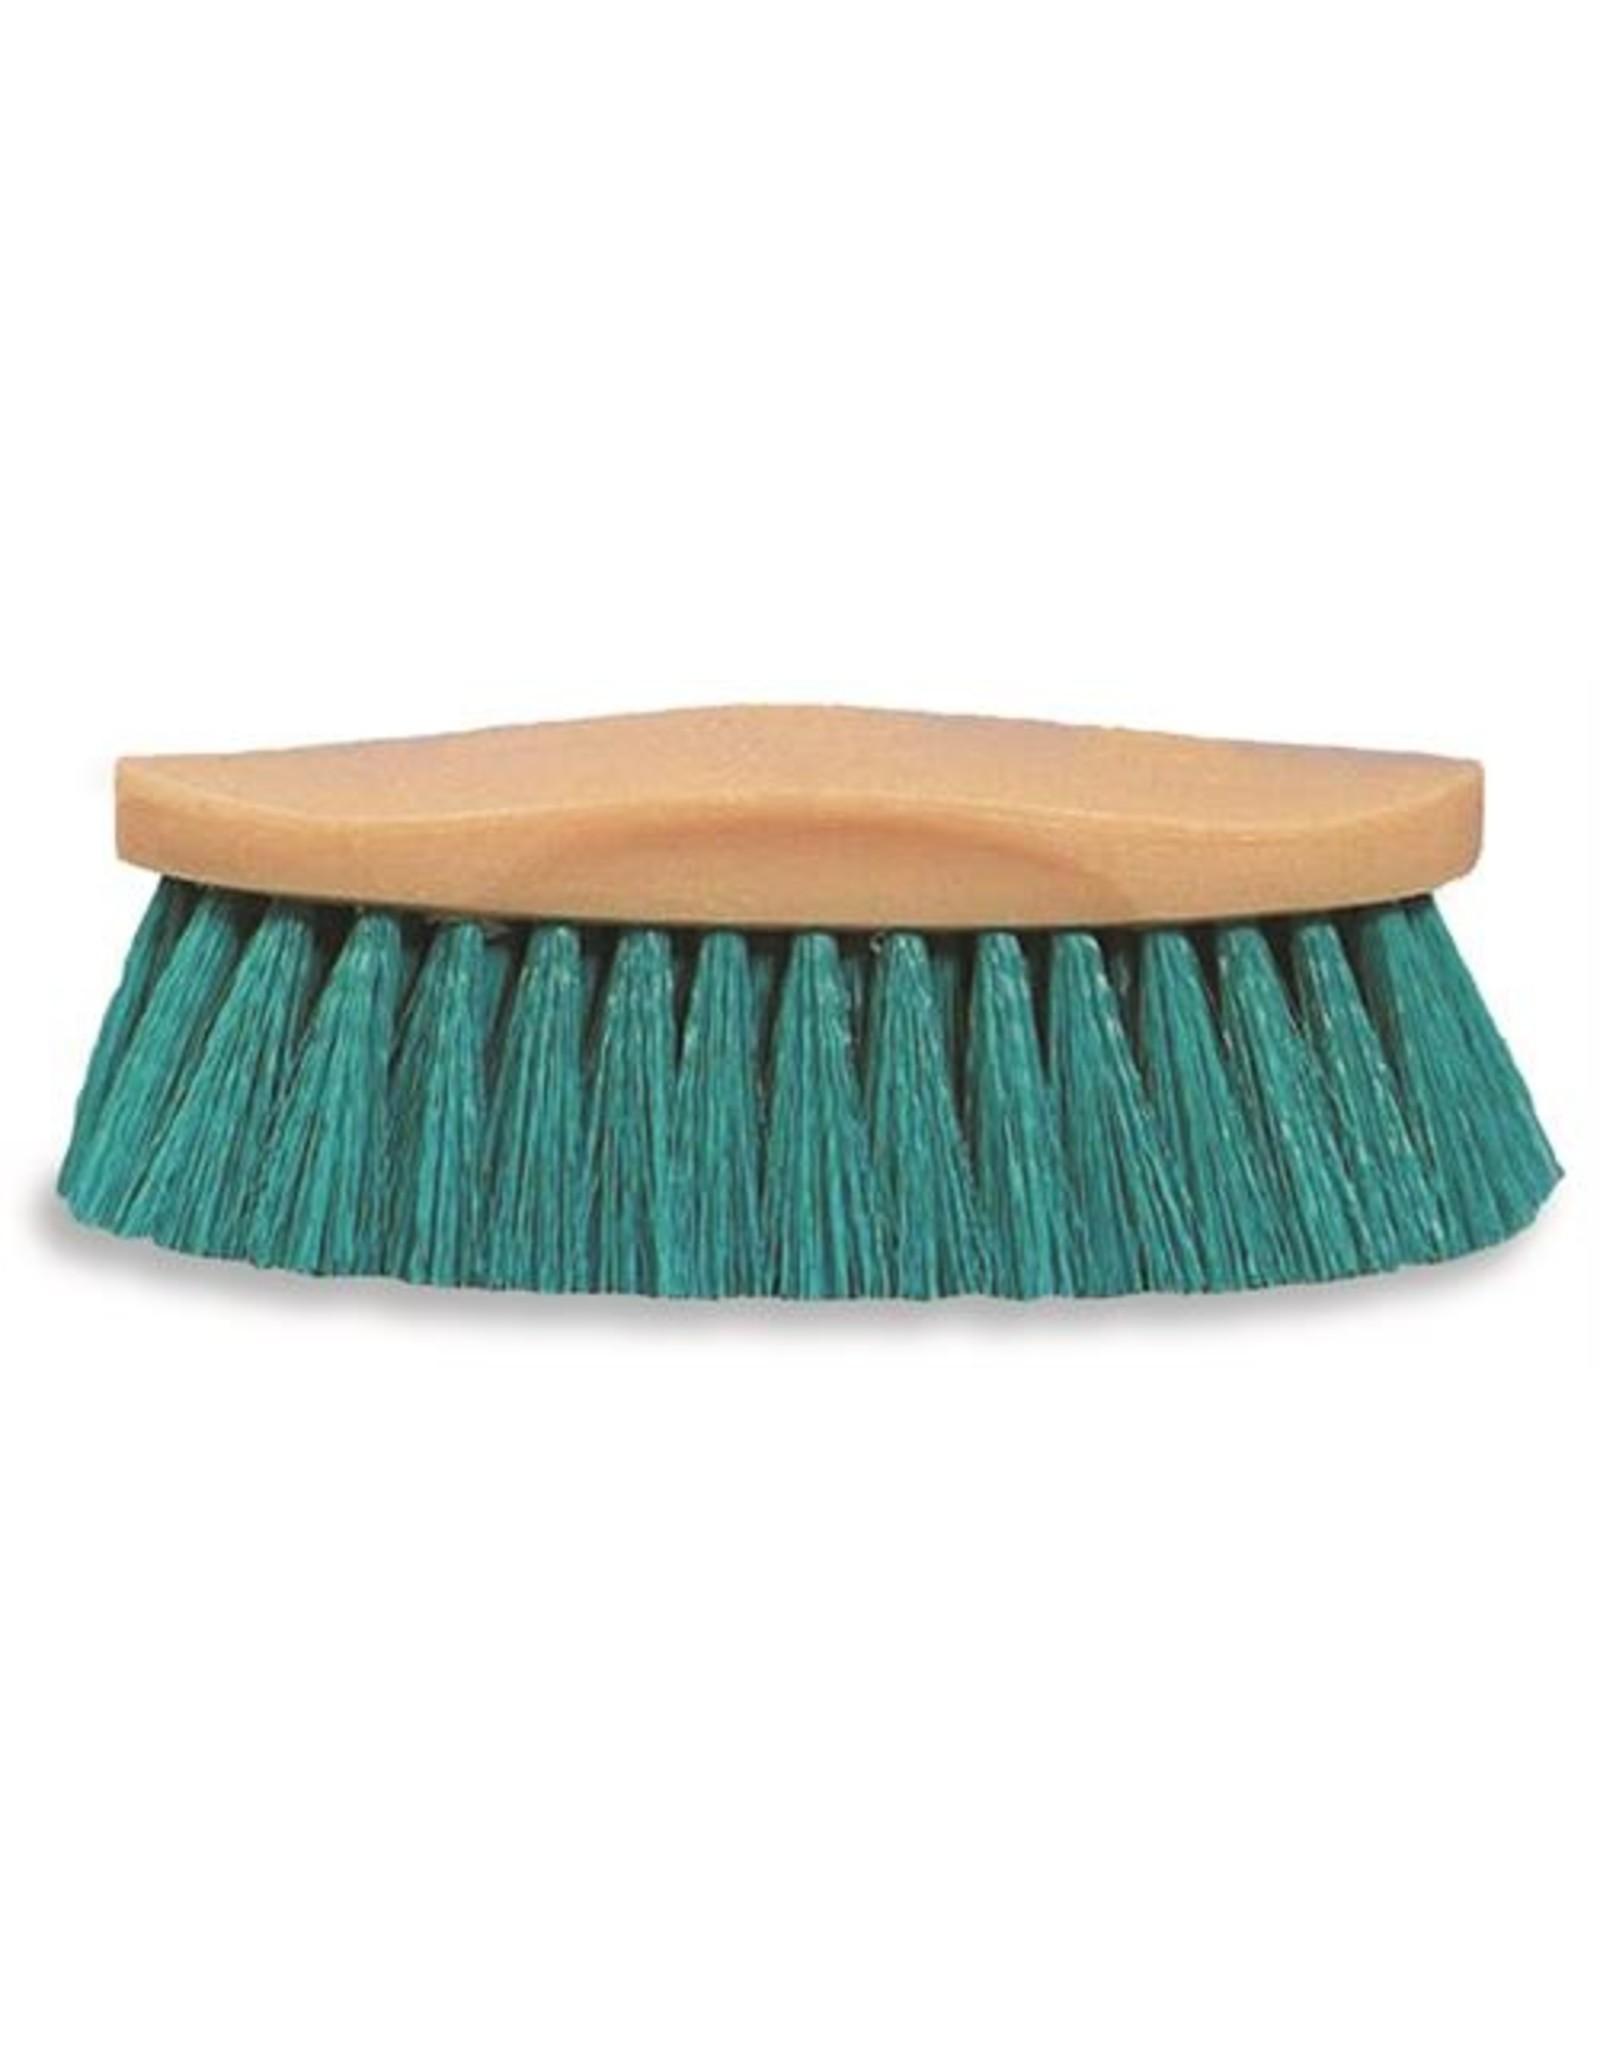 Brush The Magic 36 Soft Teal